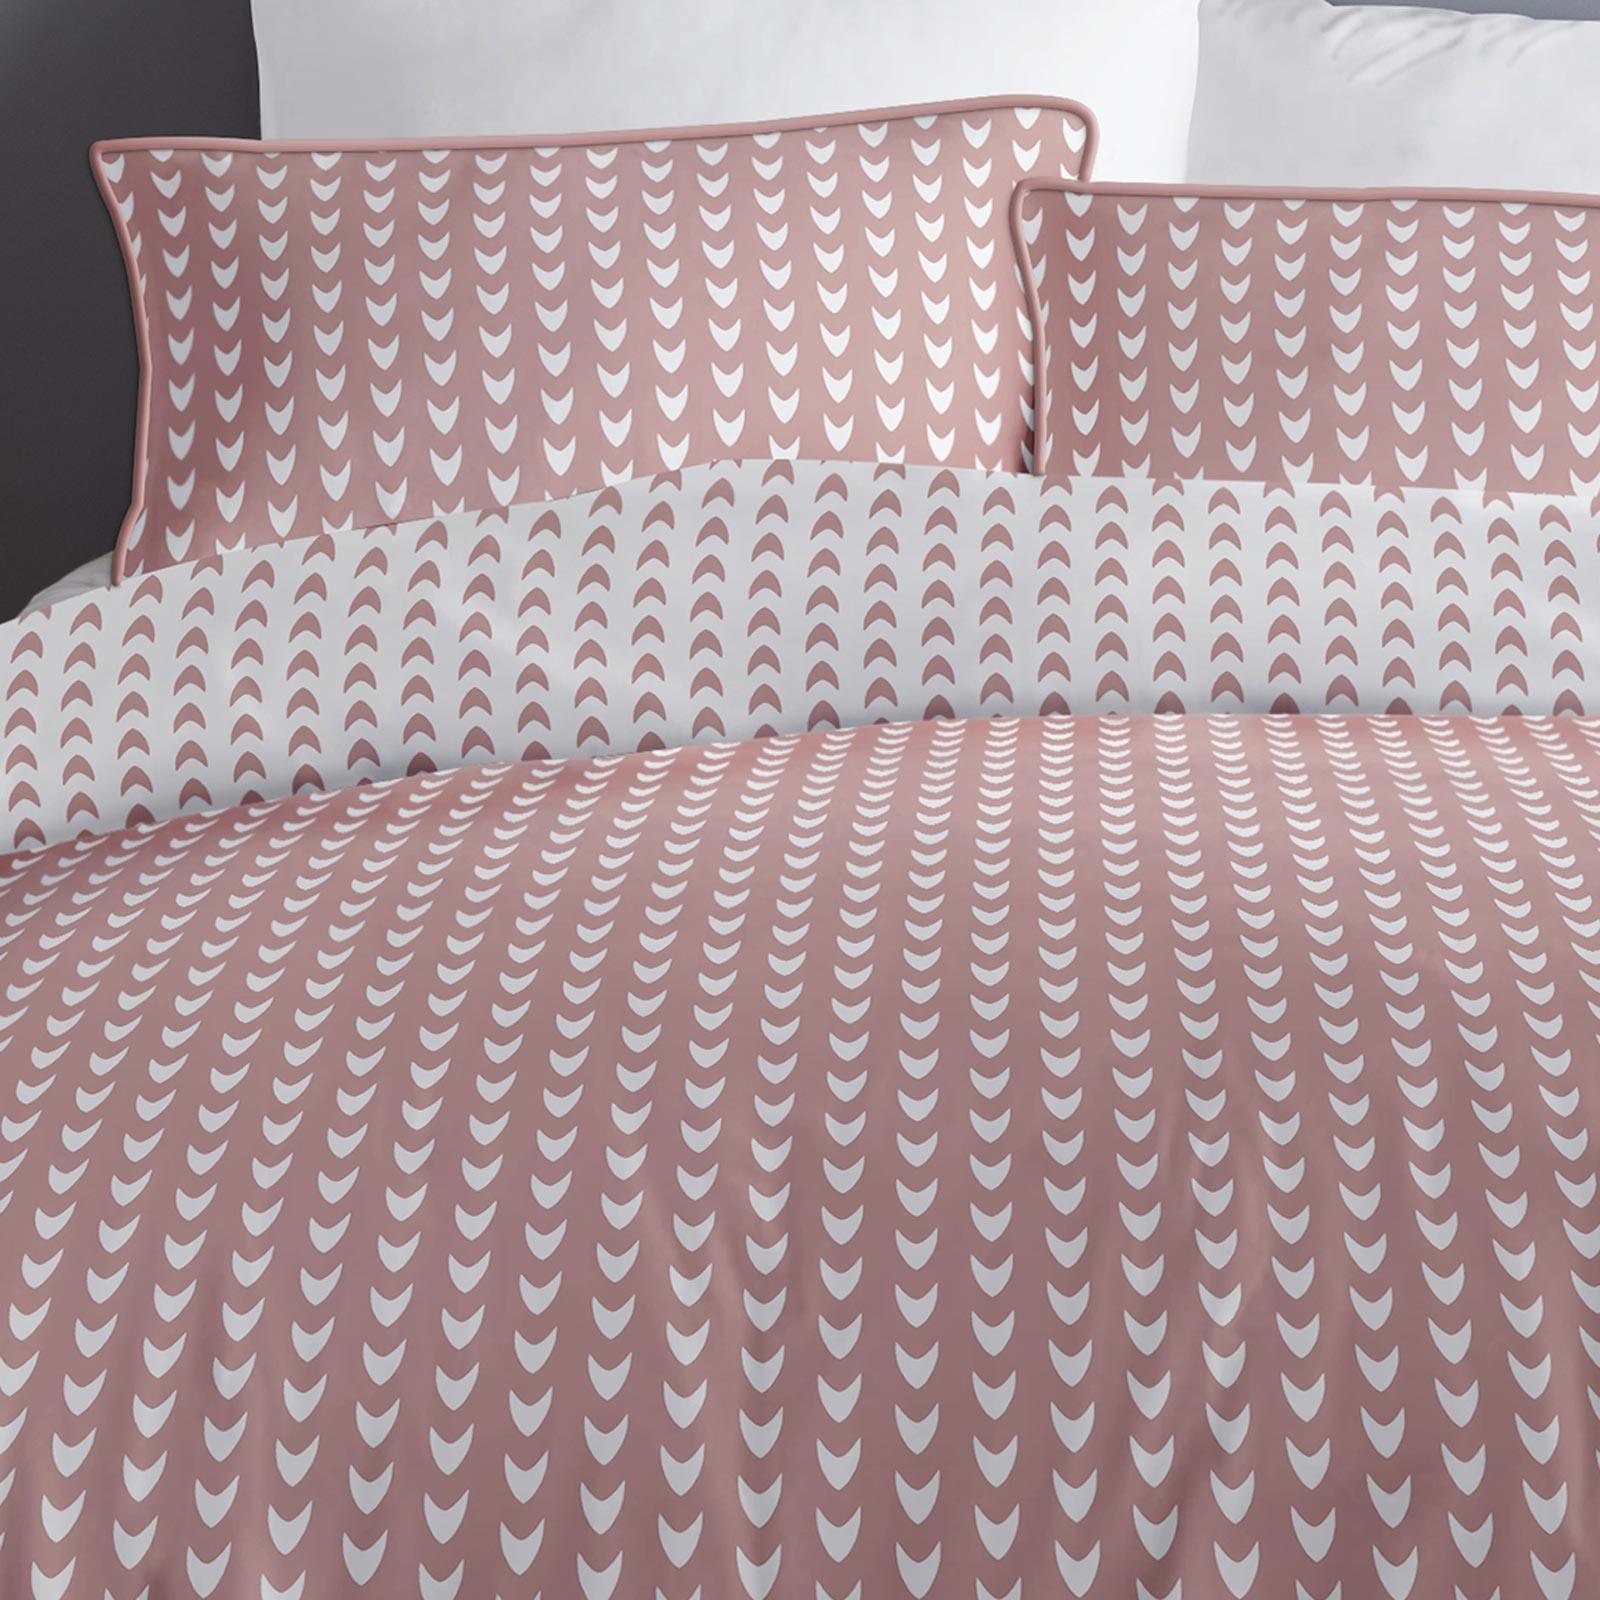 Blush-fundas-nordicas-Rosa-Geometrico-100-Algodon-Edredon-Reversible-conjuntos-de-cama miniatura 16